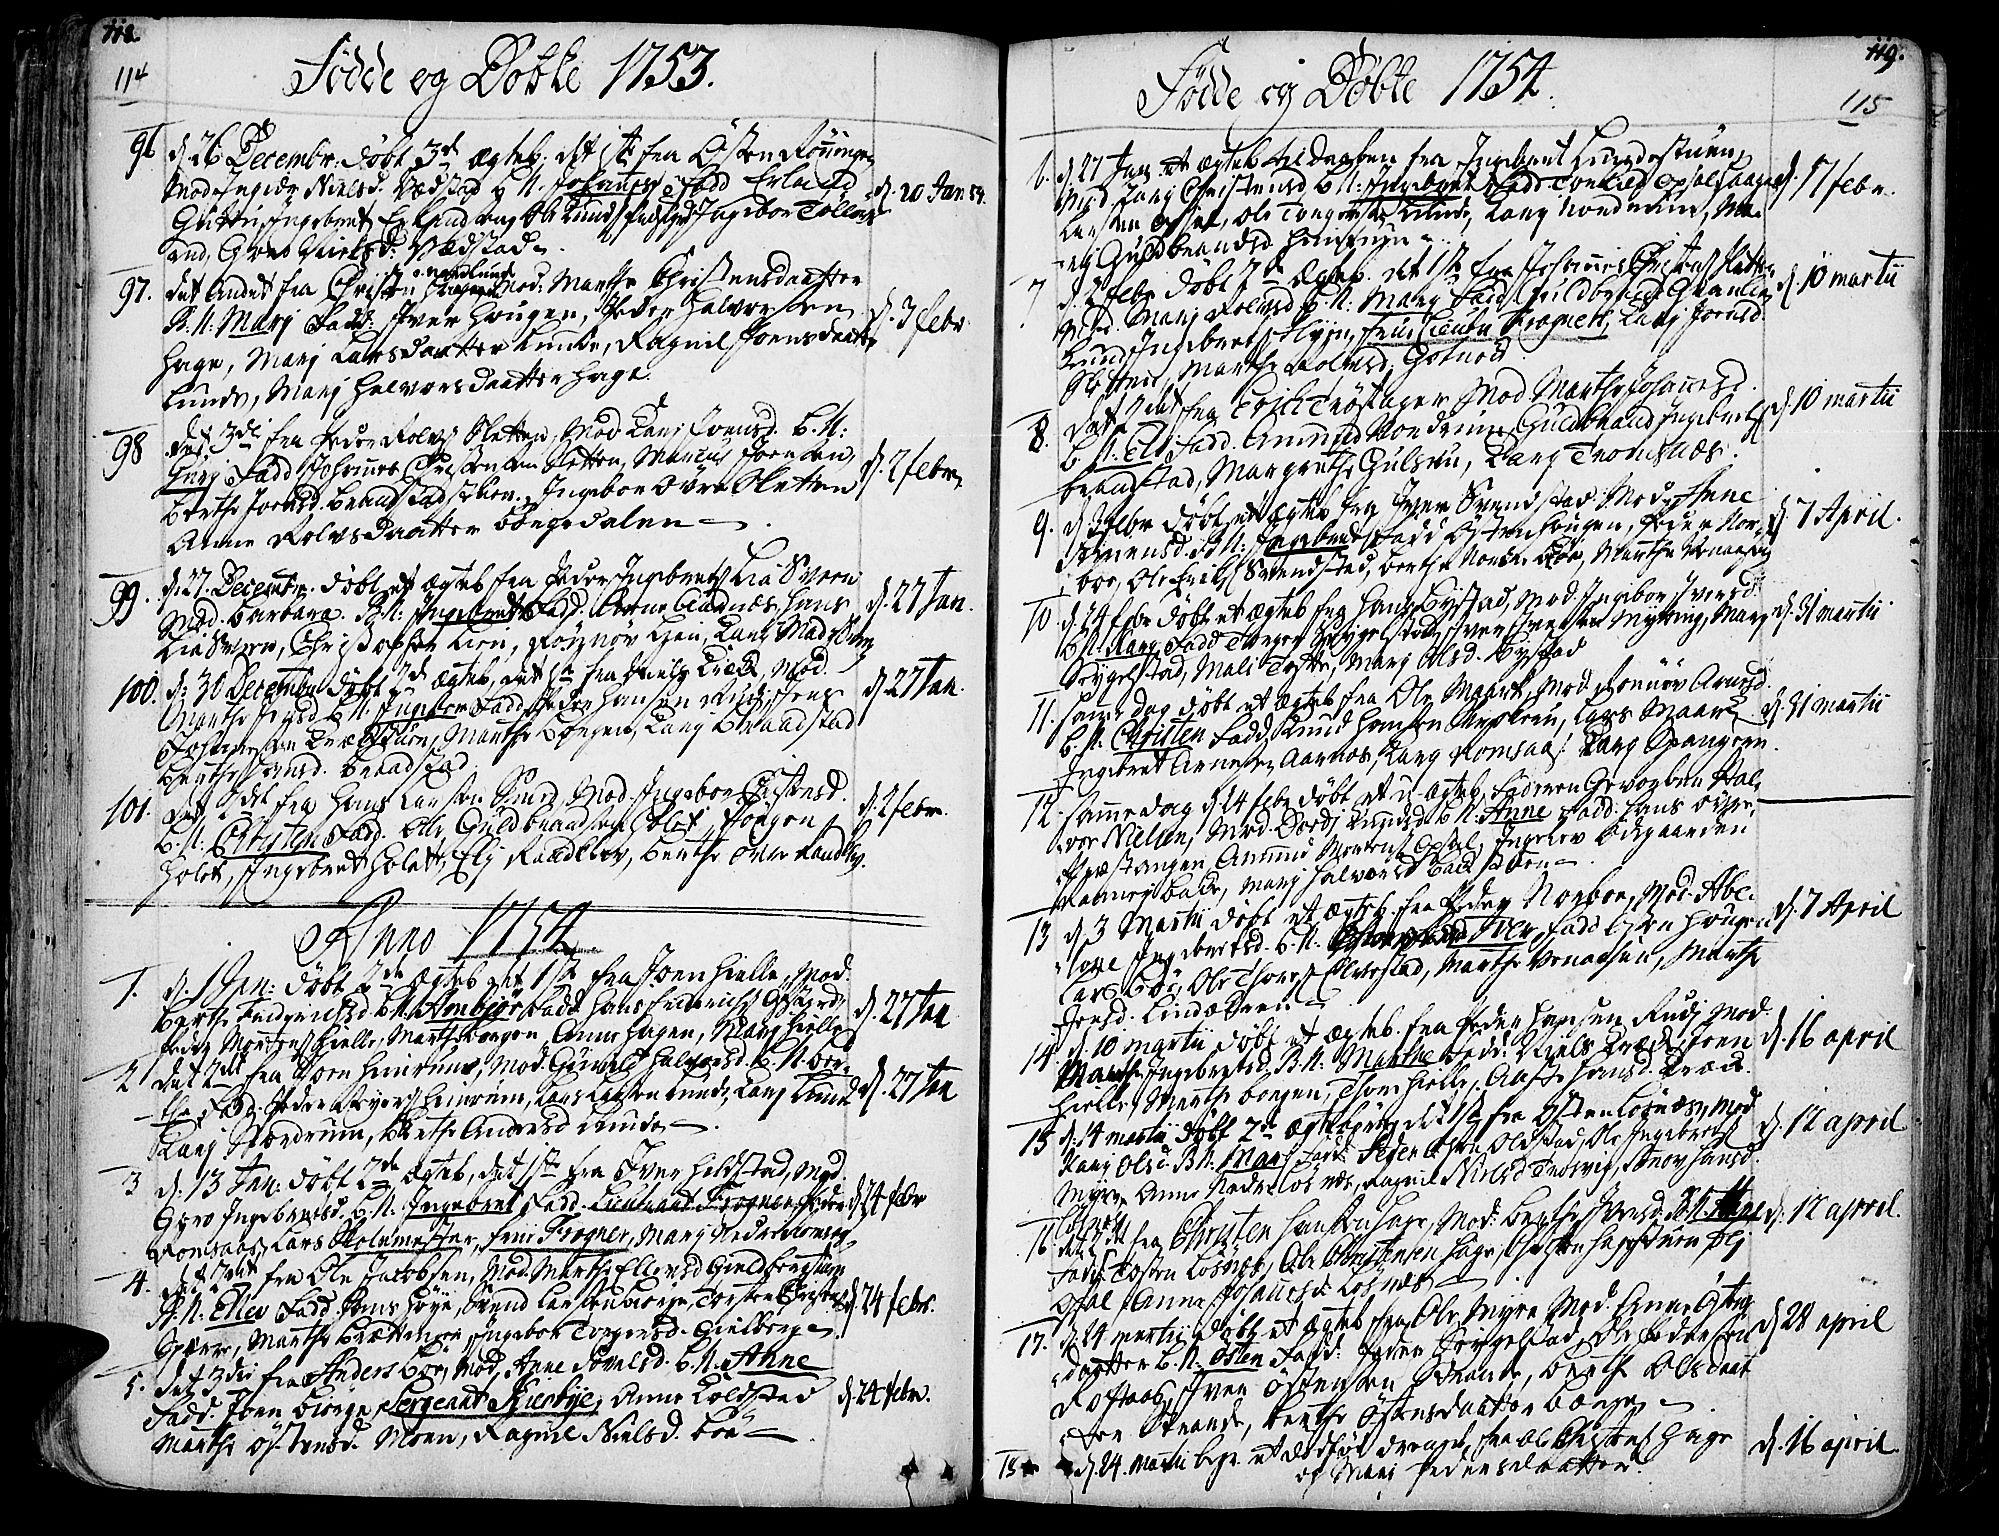 SAH, Ringebu prestekontor, Ministerialbok nr. 2, 1734-1780, s. 114-115